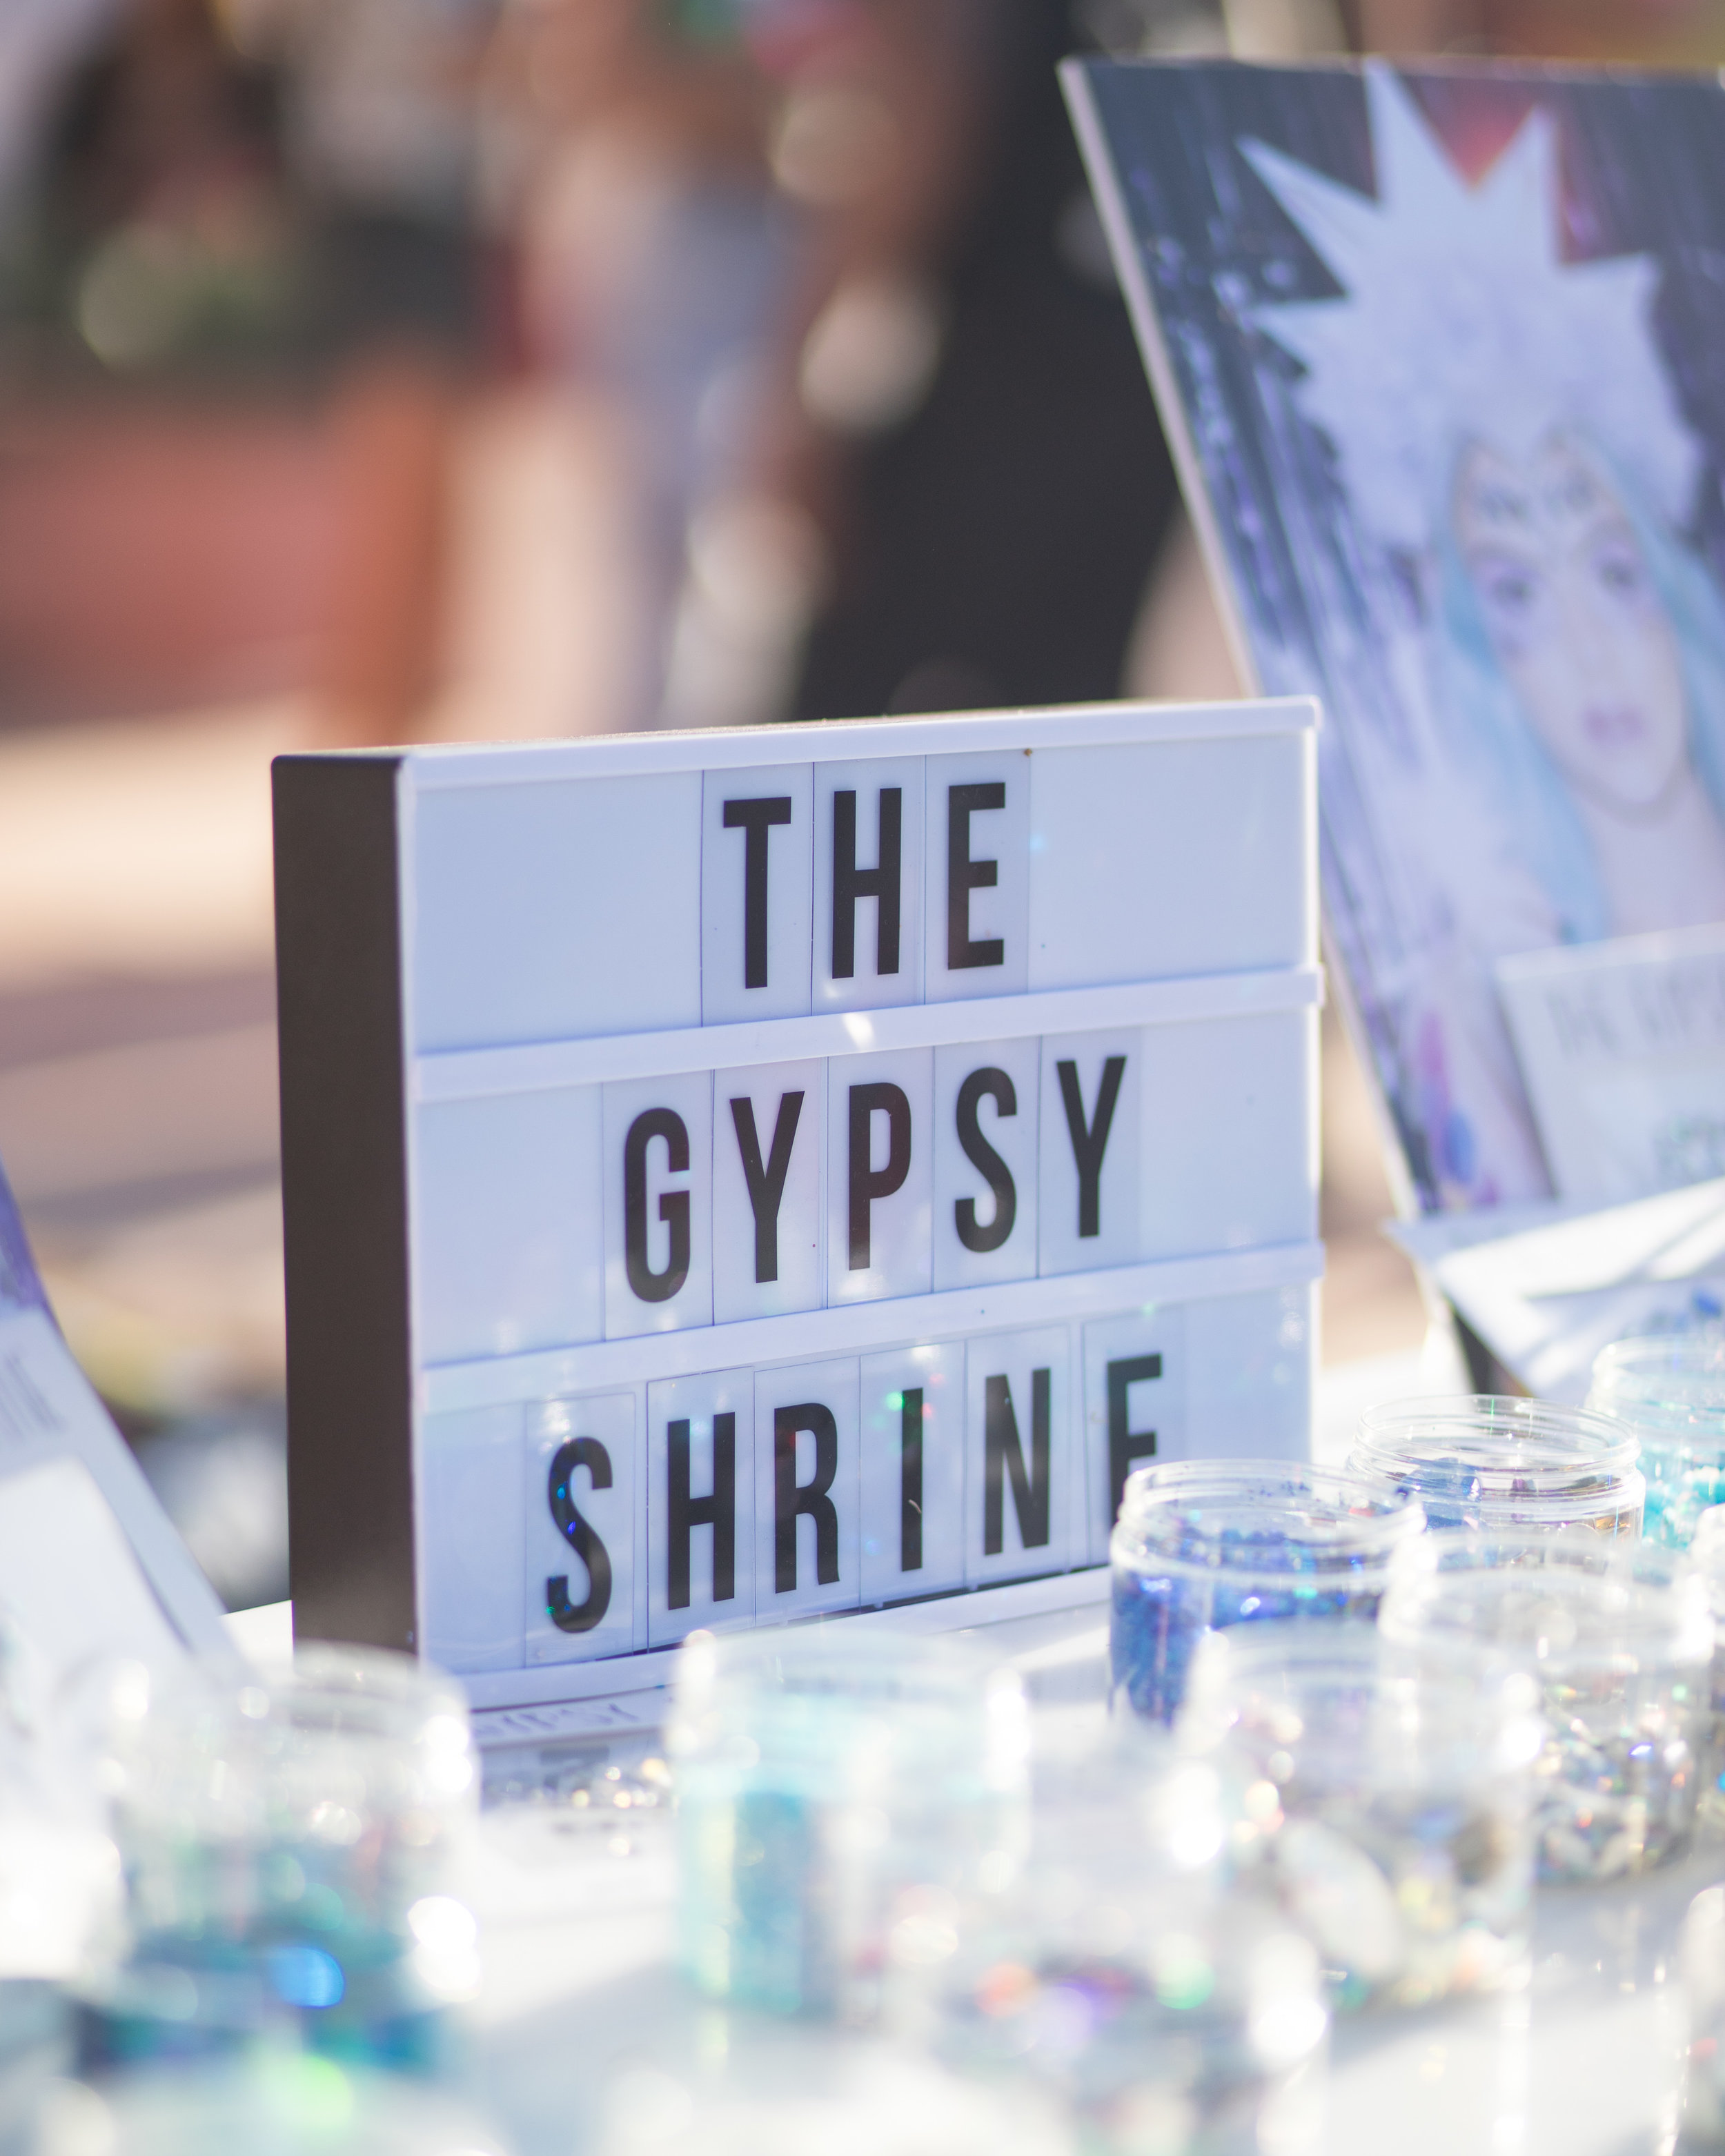 Ultimate Hollywood Coachella Poolside Party the gypsy shrine.jpg